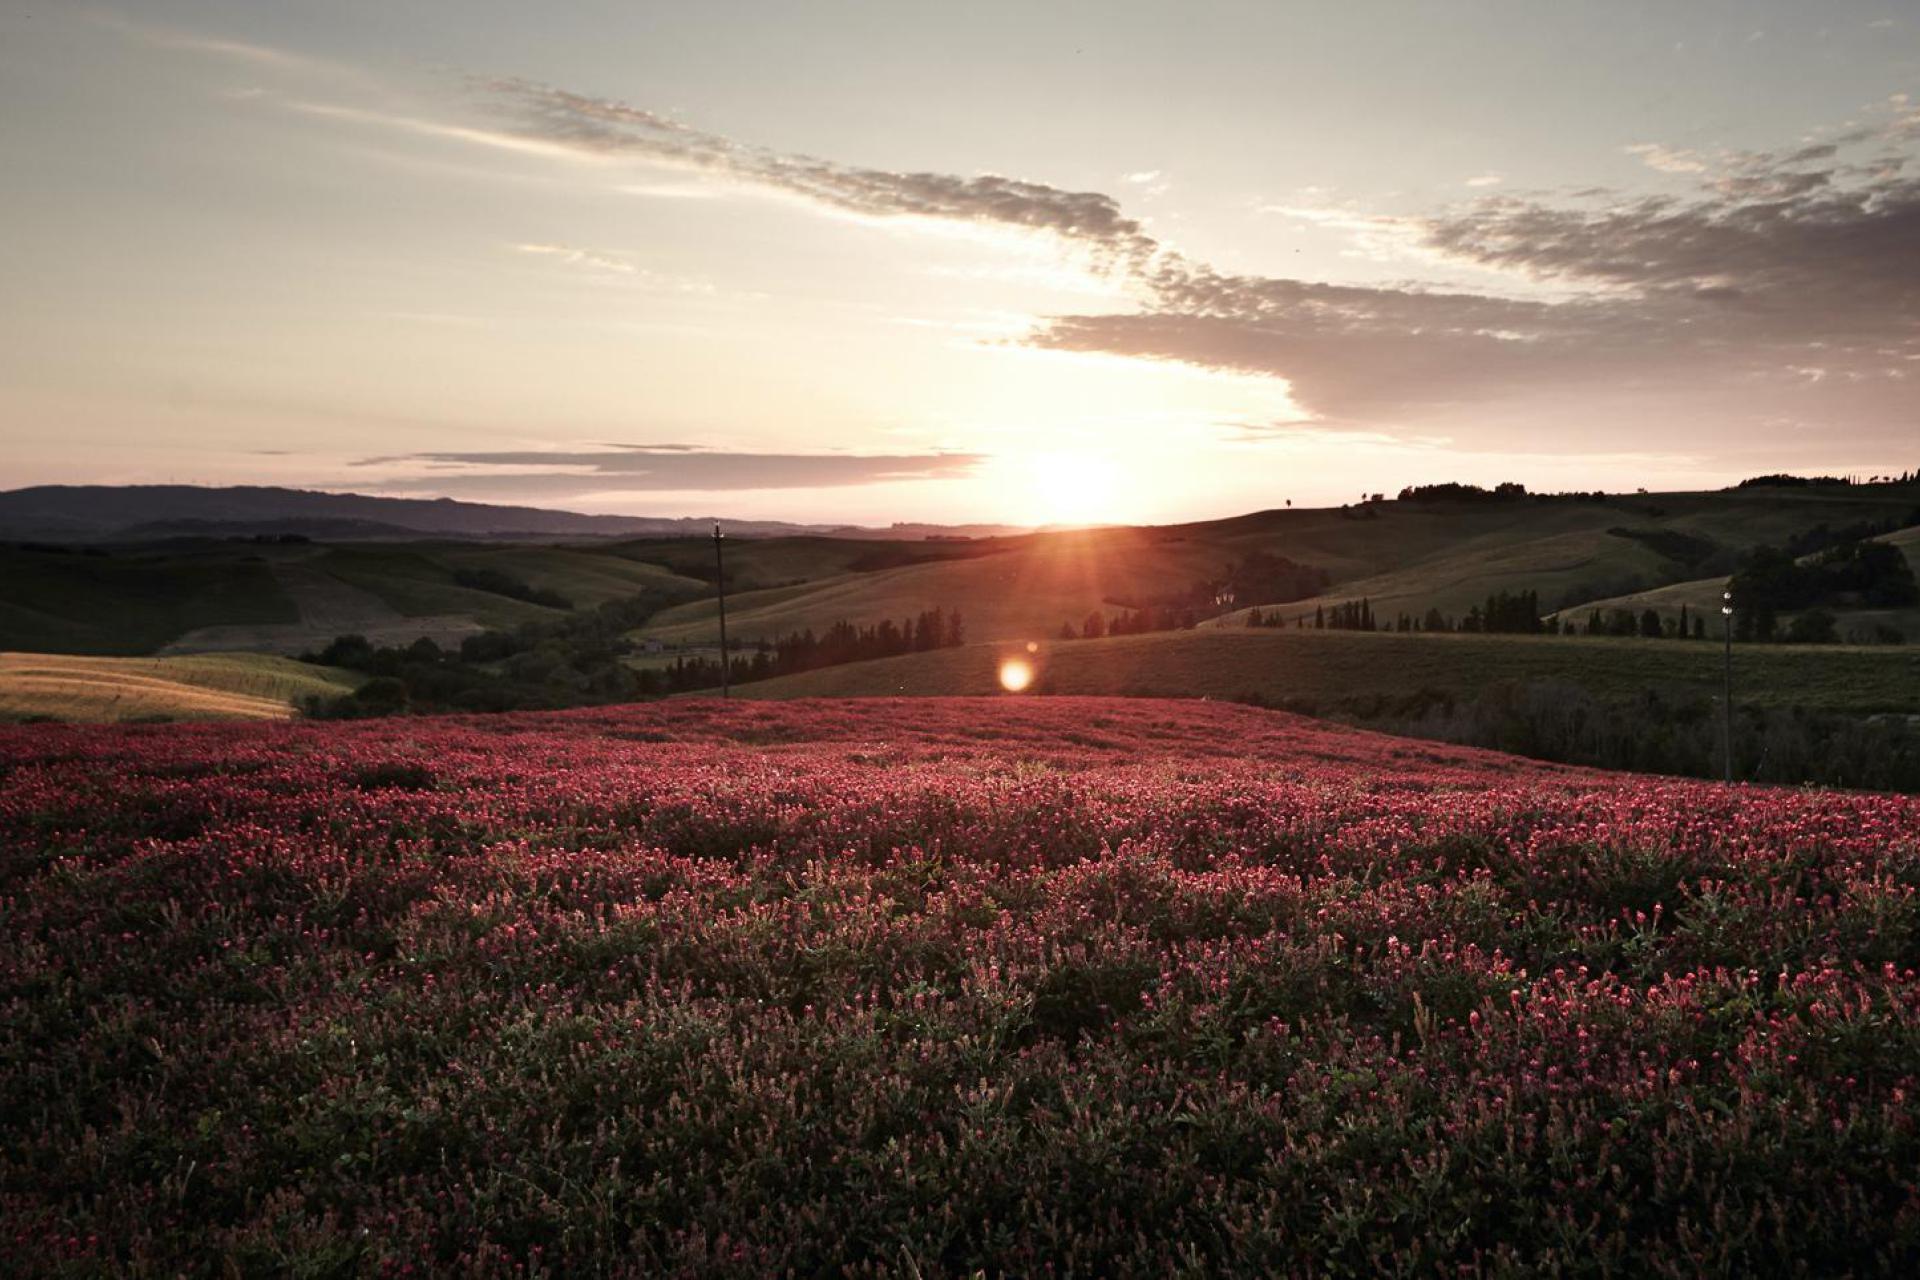 Agriturismo Toscana agriturismo per famiglie situato in posizione centrale in Toscana